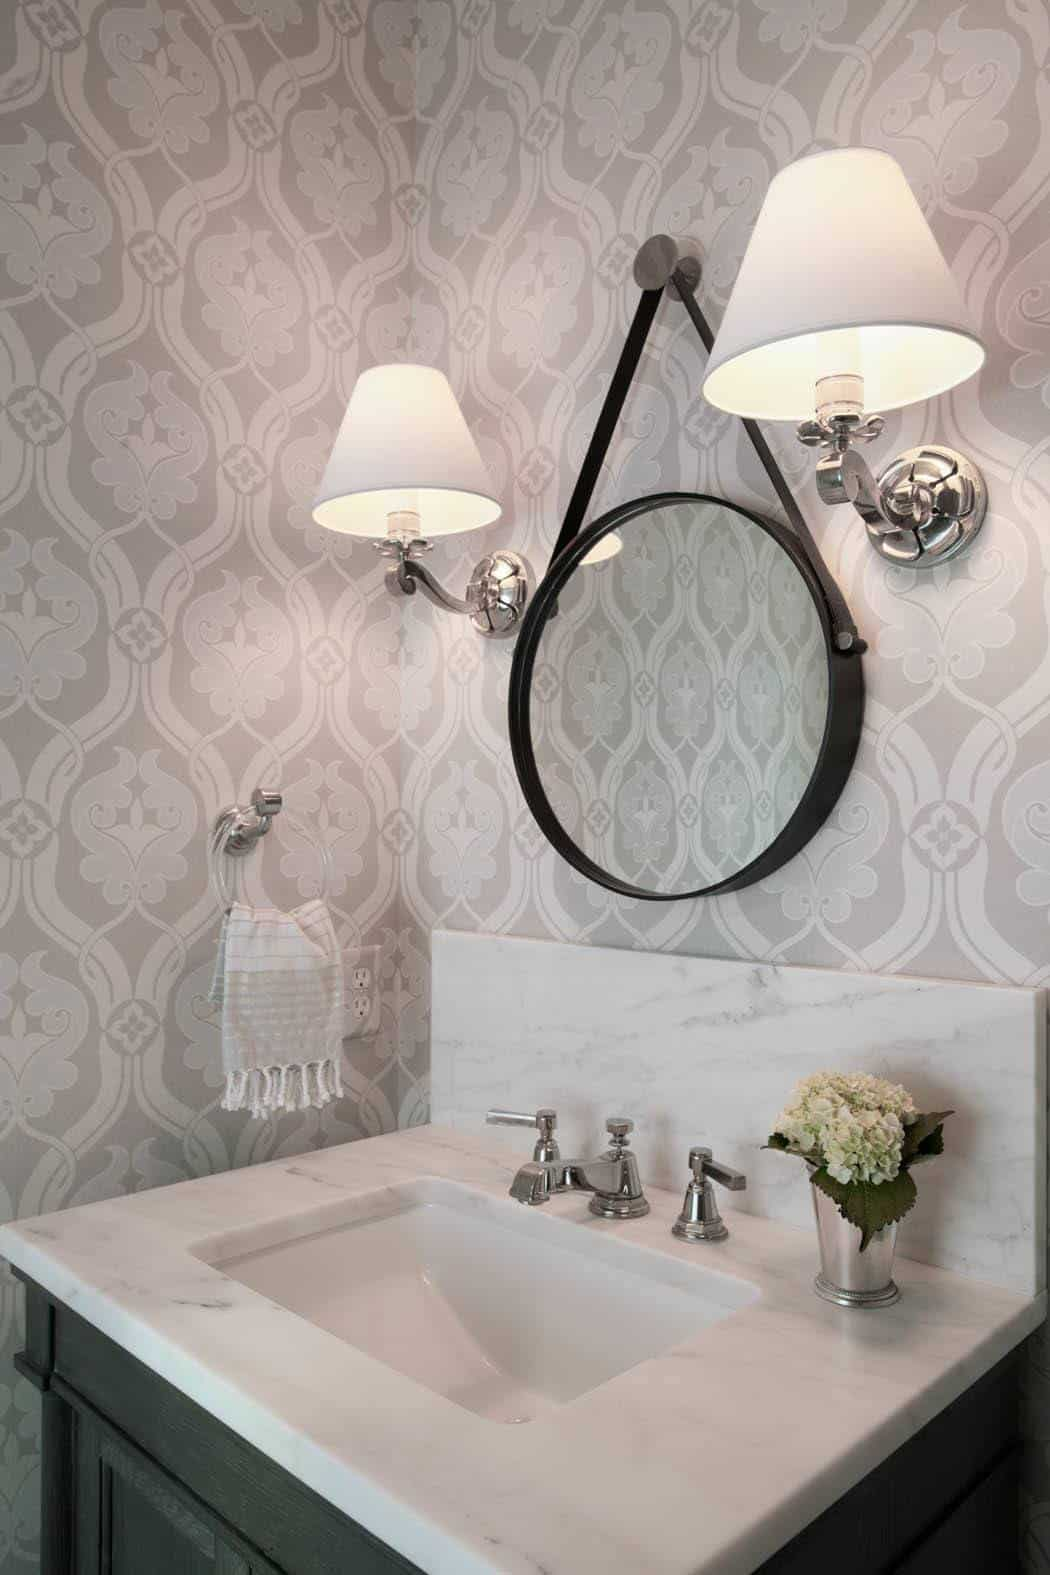 Waterfront Home-Rethink Design Studio-05-1 Kindesign